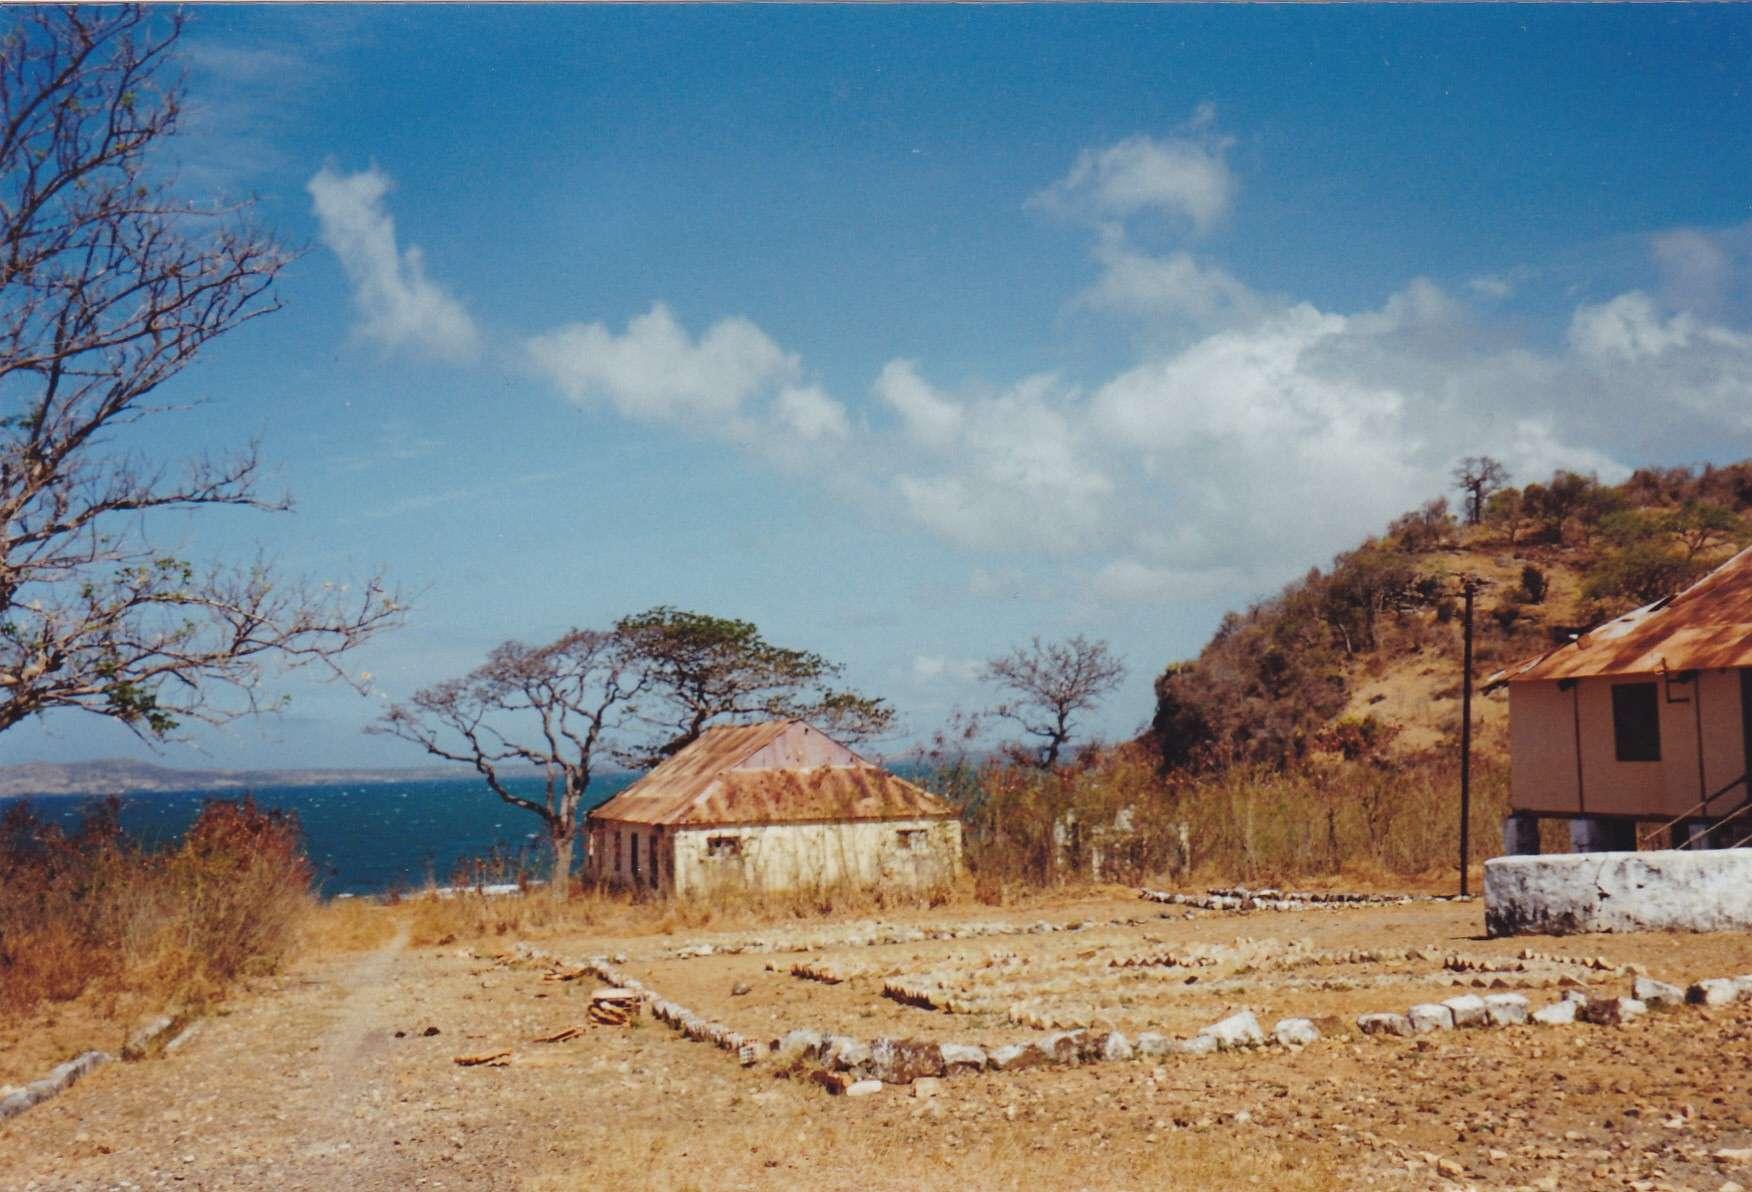 [Divers campagne Madagascar] CAP DIEGO AU CID 1972 - Page 2 Img_0028